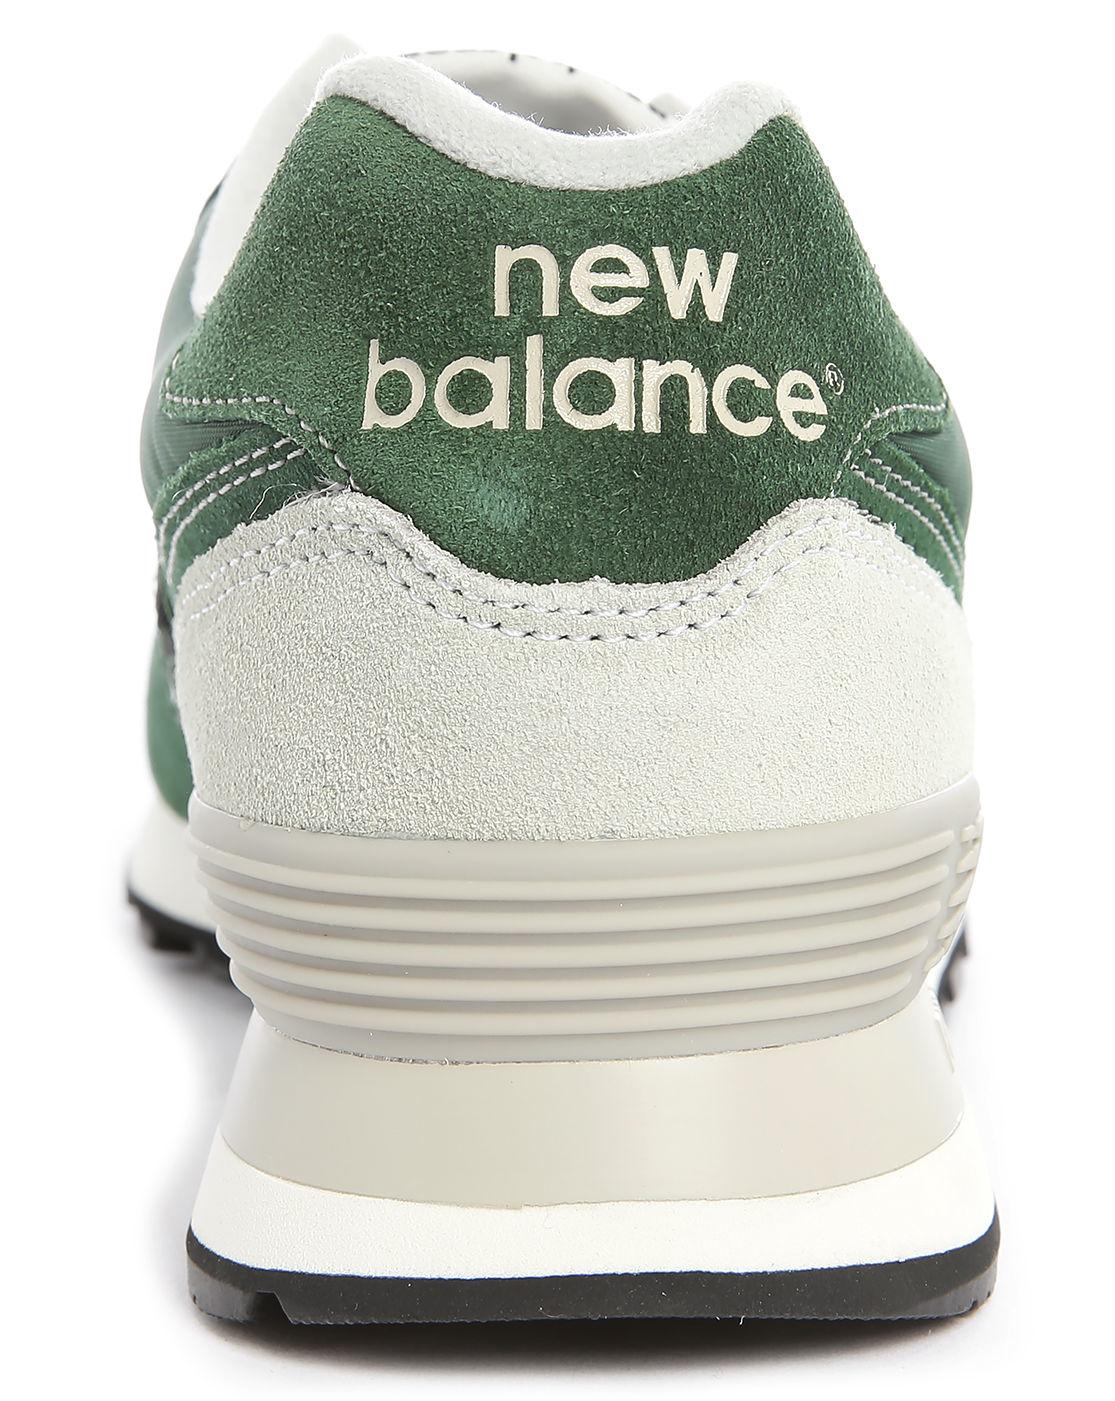 new balance 574 green suede handbag